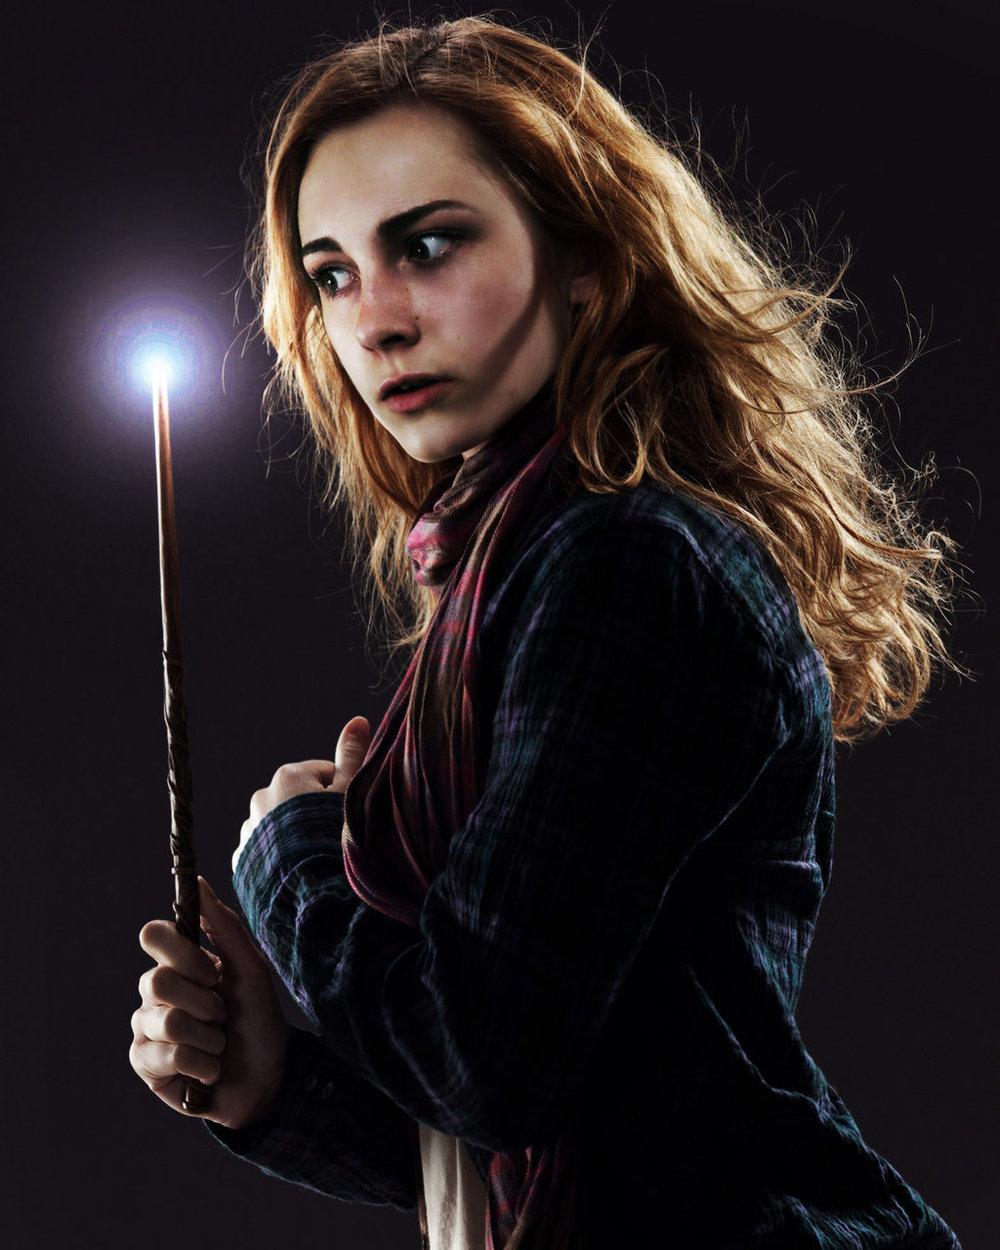 hermione_granger_lumos_by_a_scudder-d69kkq4.jpg